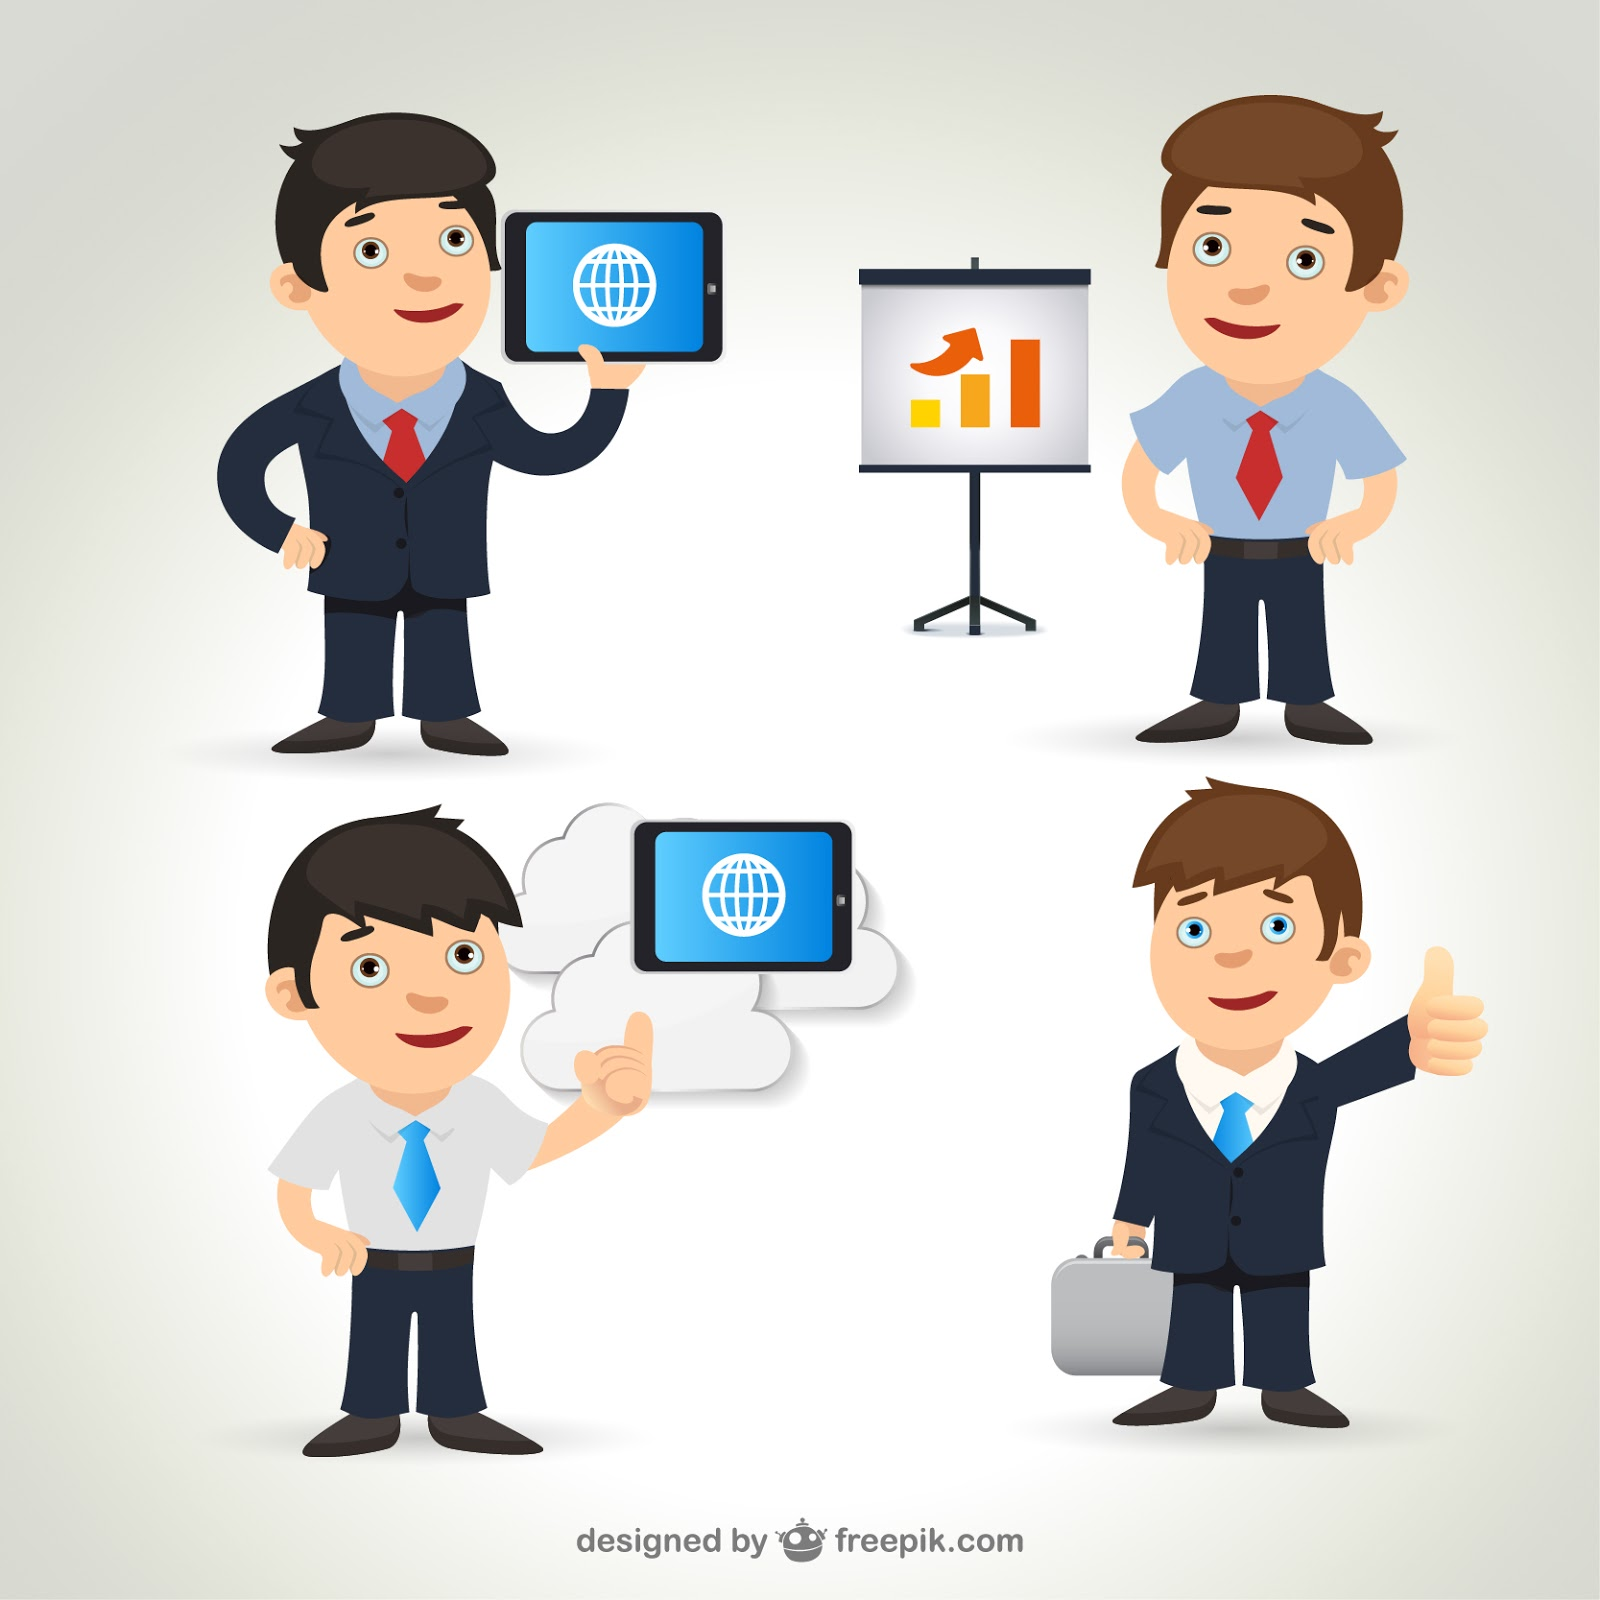 Fulfilresume Blogspot Com การเขียนคุณสมบัติของผู้สมัครงาน